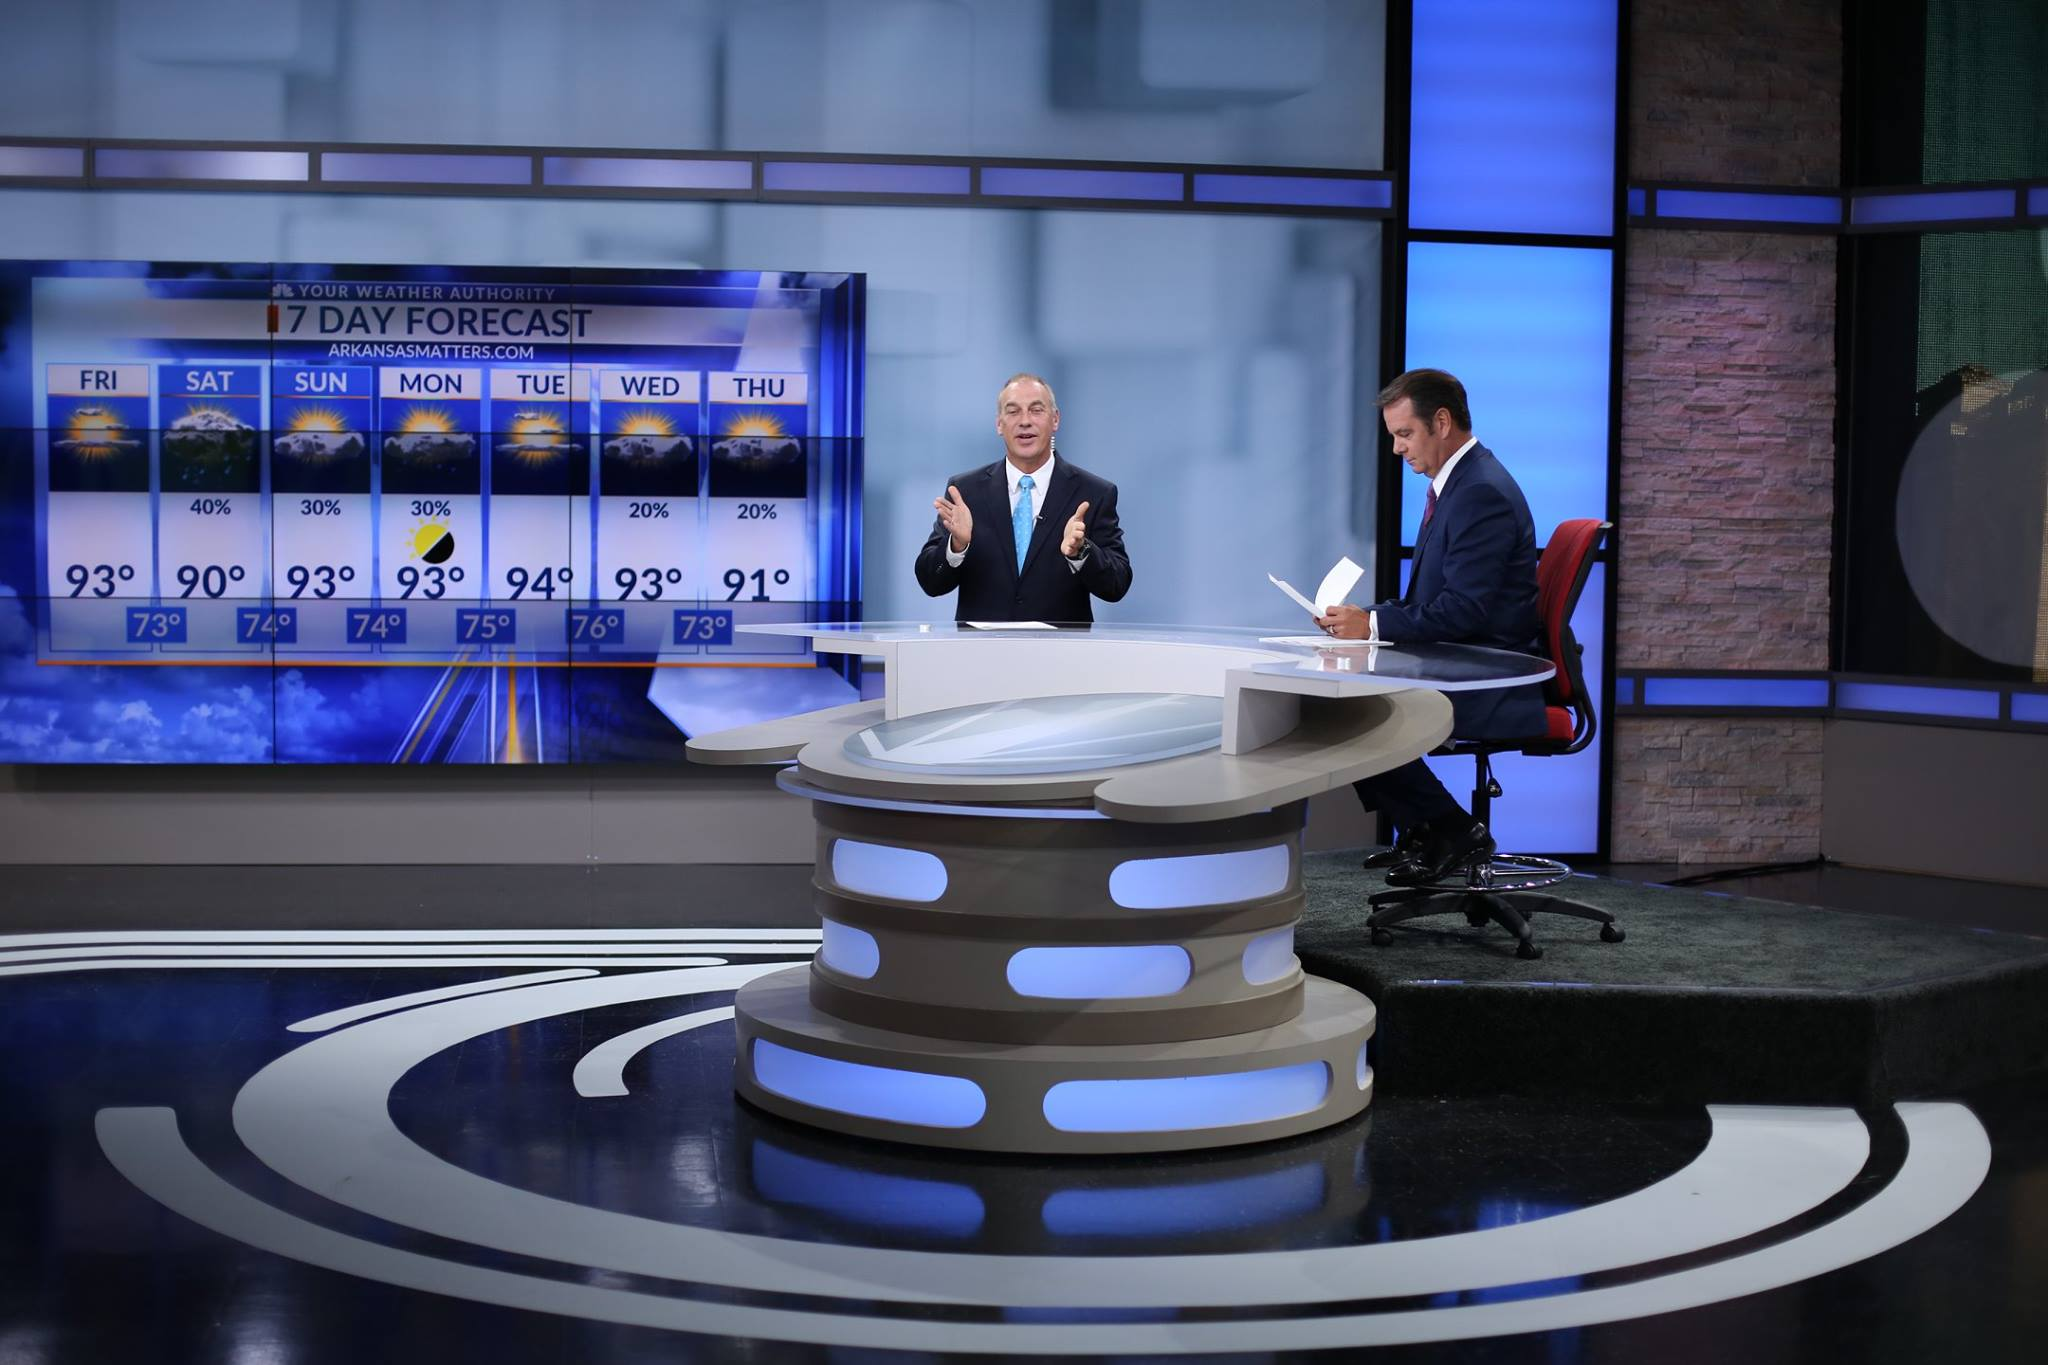 ncs_kark-4-news-tv-studio-arkansas_0004